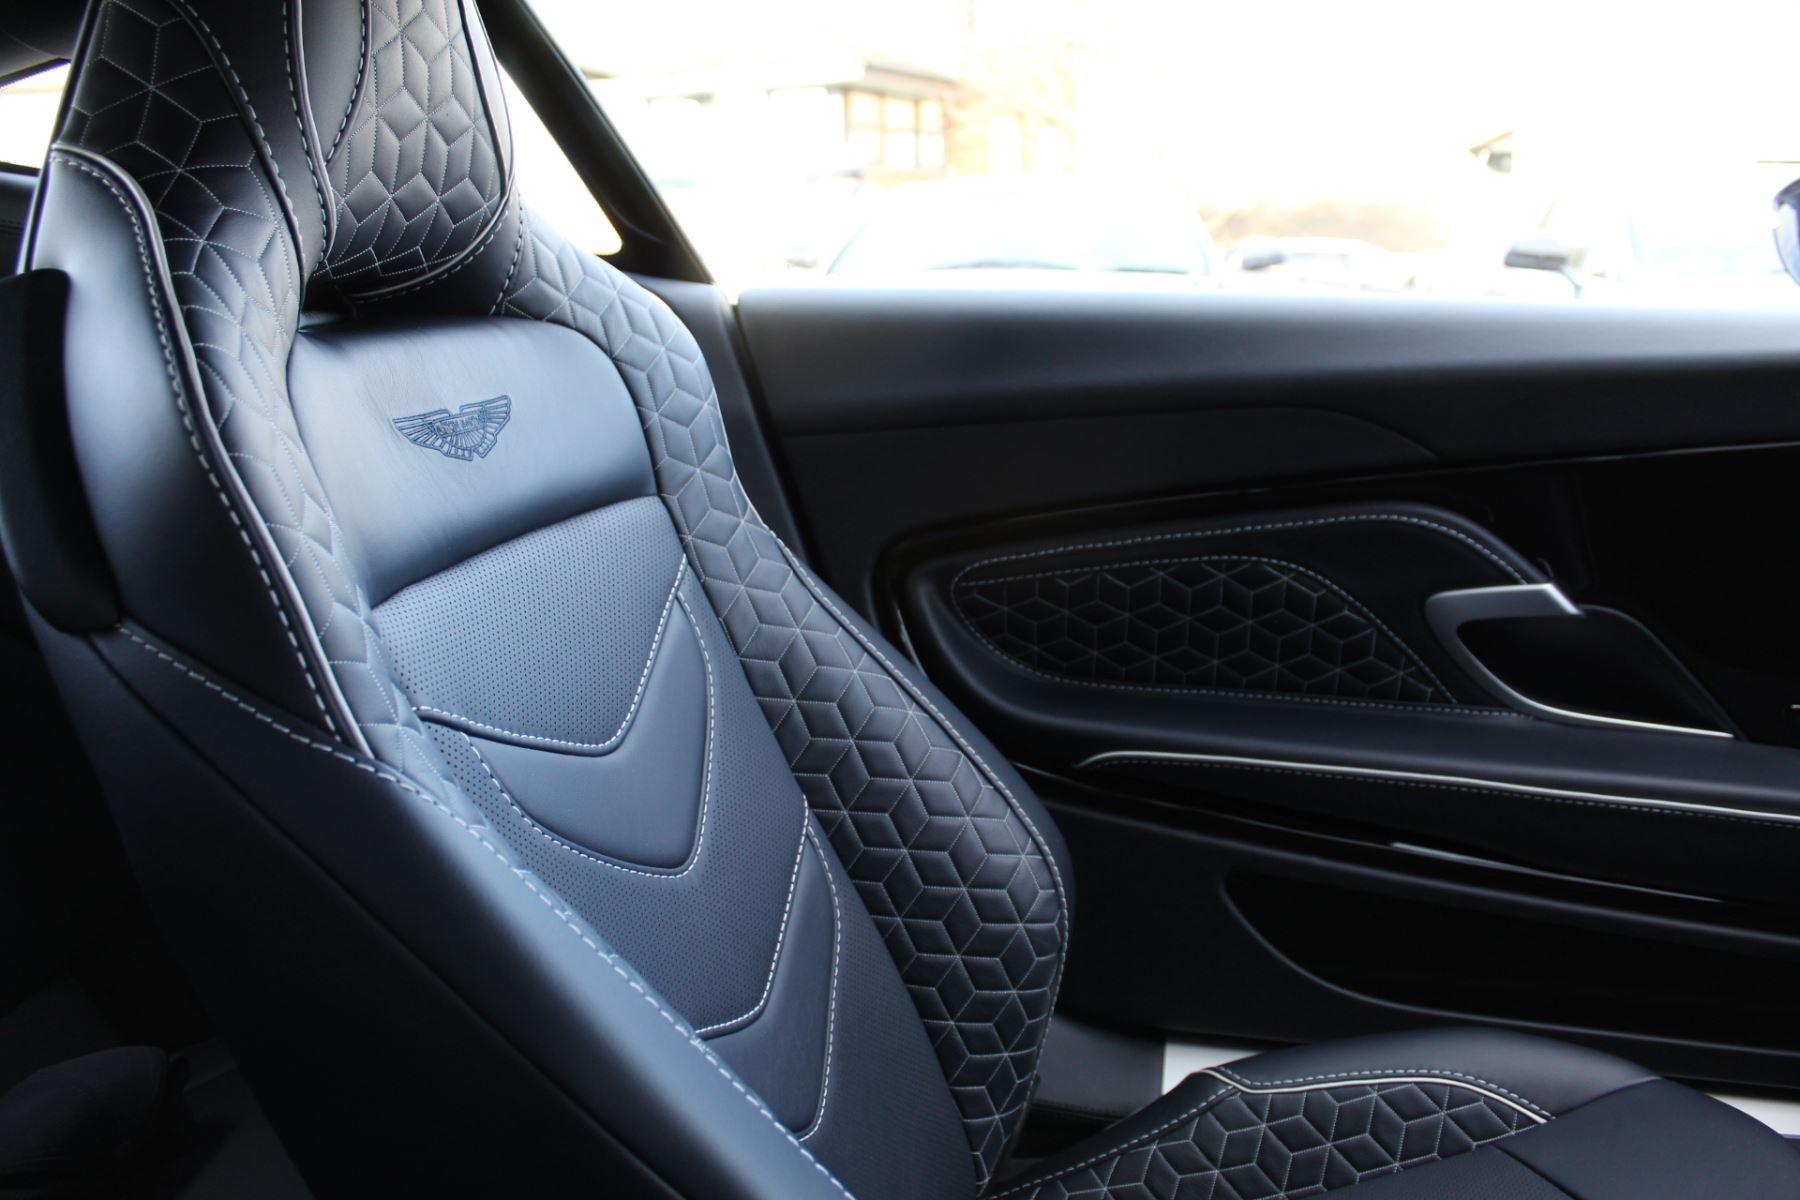 Aston Martin DBS Superleggera V12 2dr Touchtronic image 9